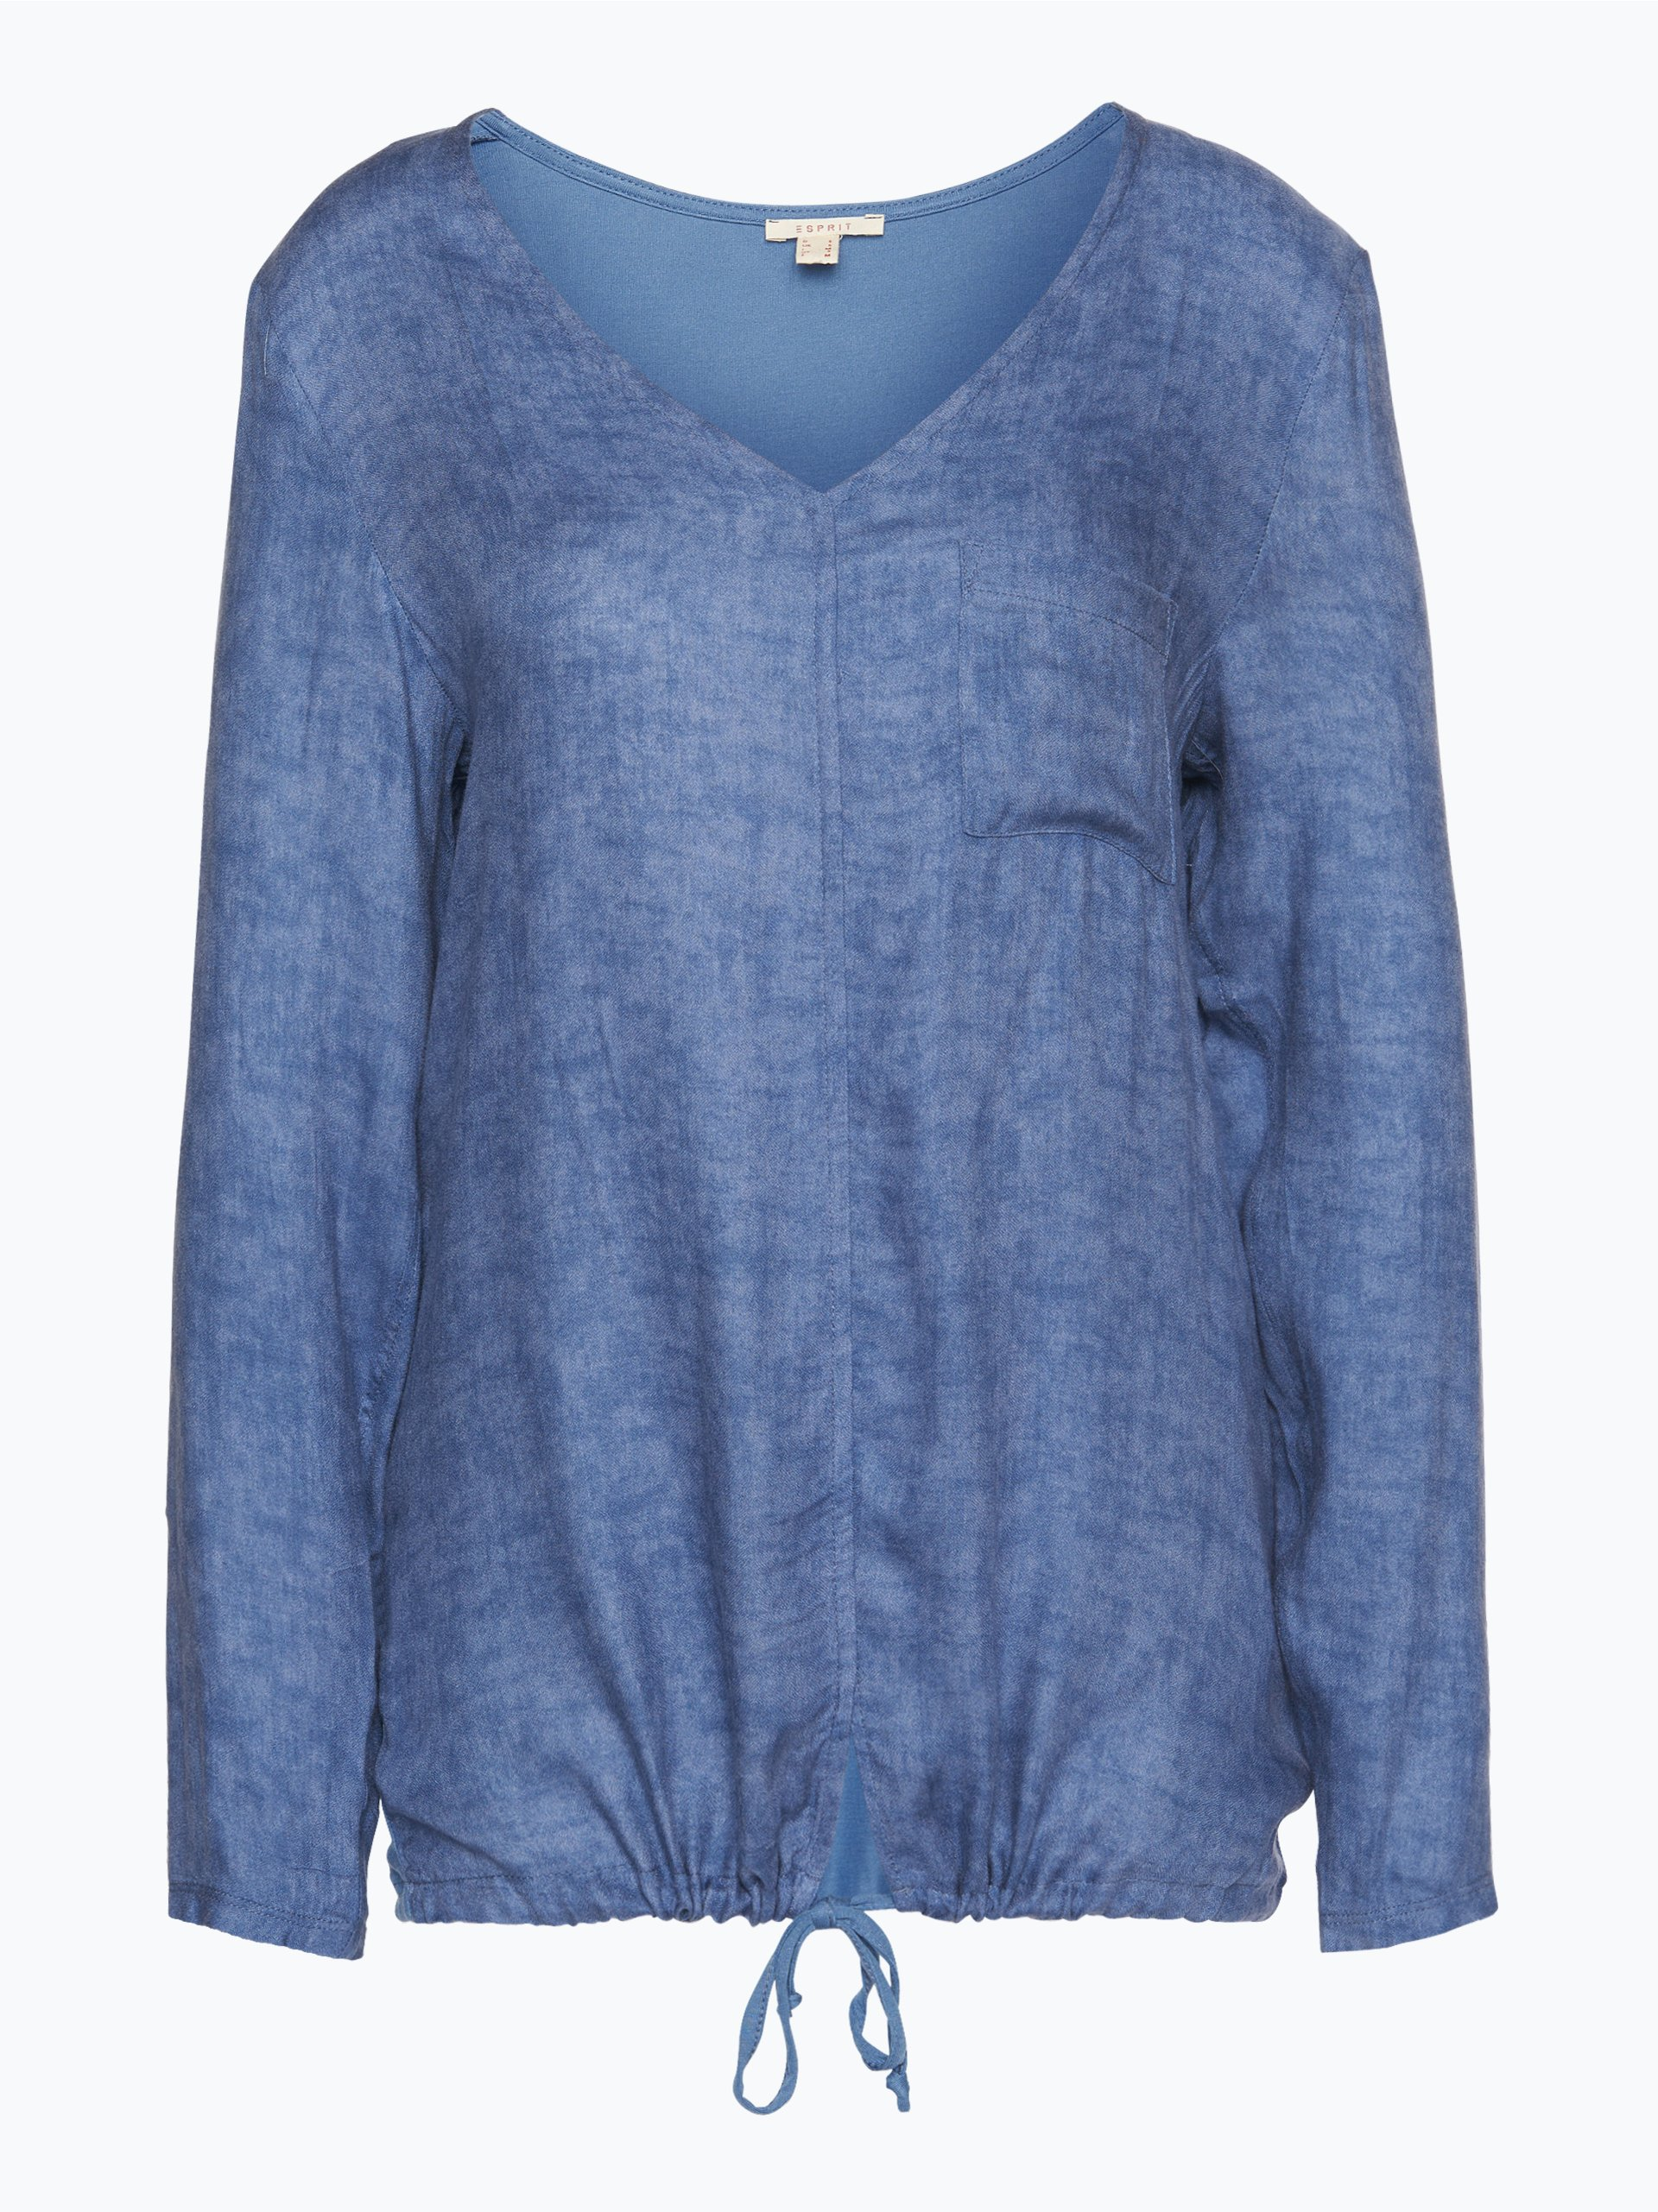 esprit casual damen blusenshirt indigo uni online kaufen. Black Bedroom Furniture Sets. Home Design Ideas